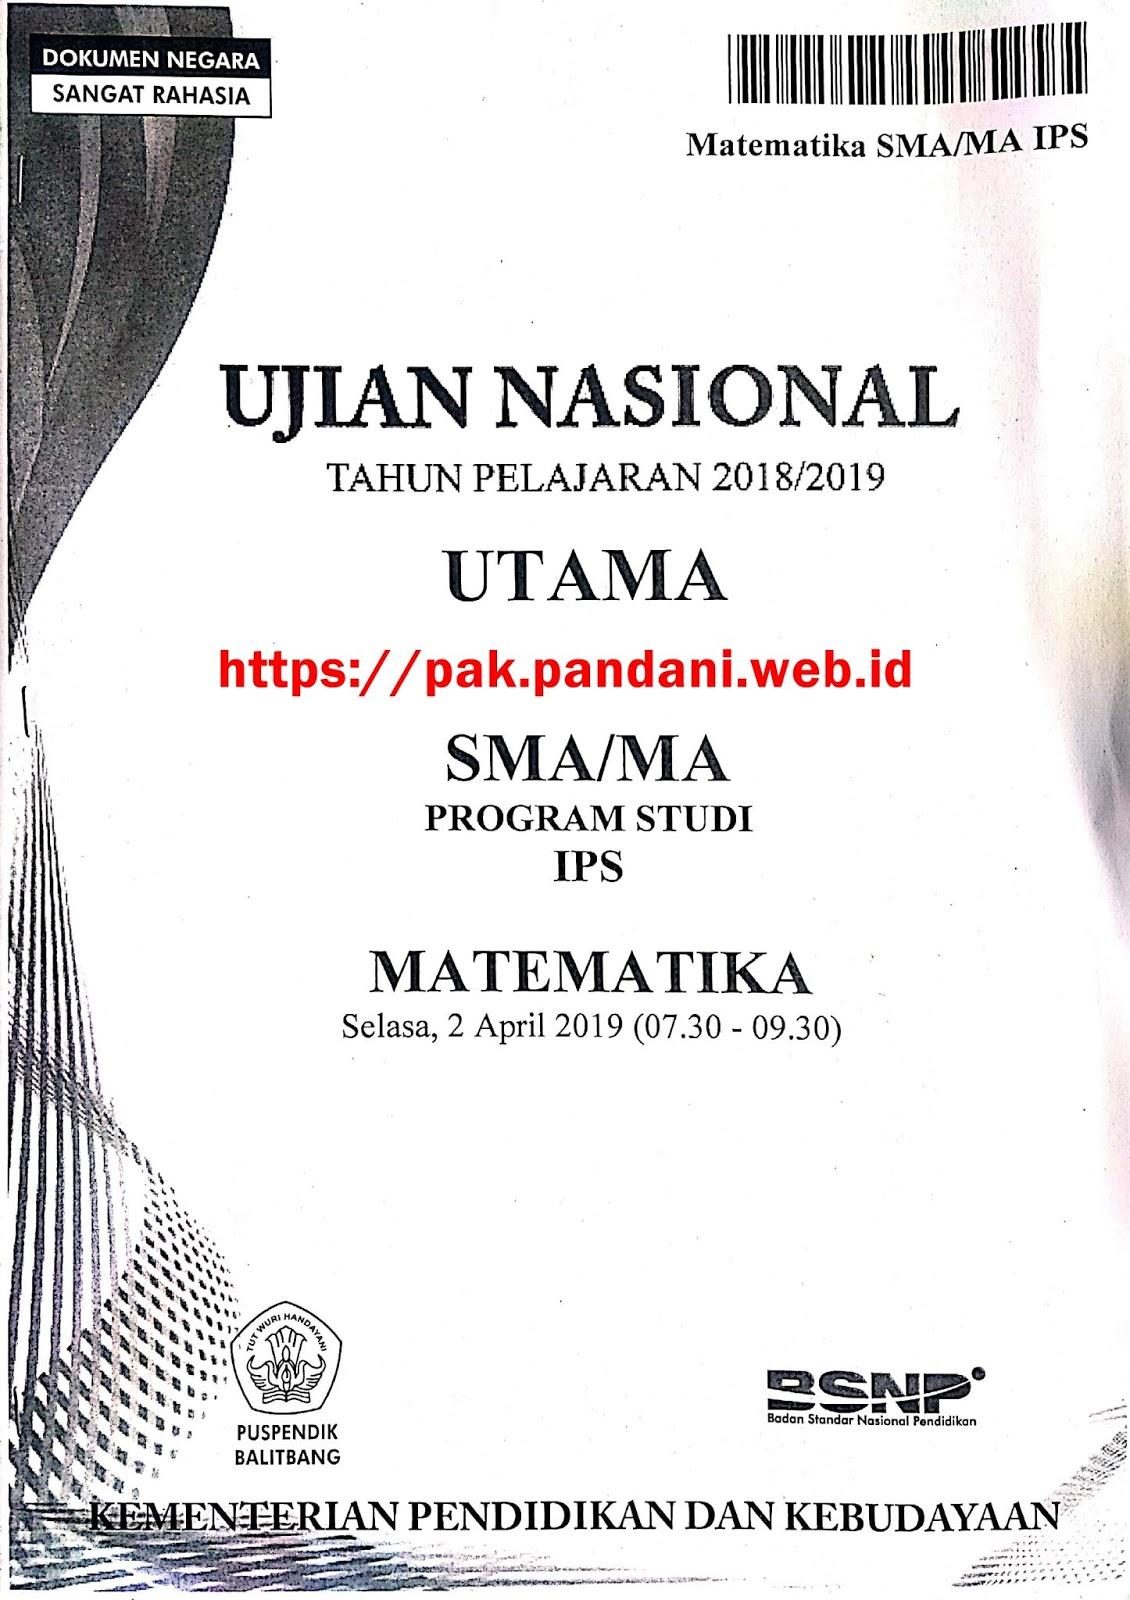 Soal Un Matematika Sma Ips Tahun 2019 Blog Pak Pandani